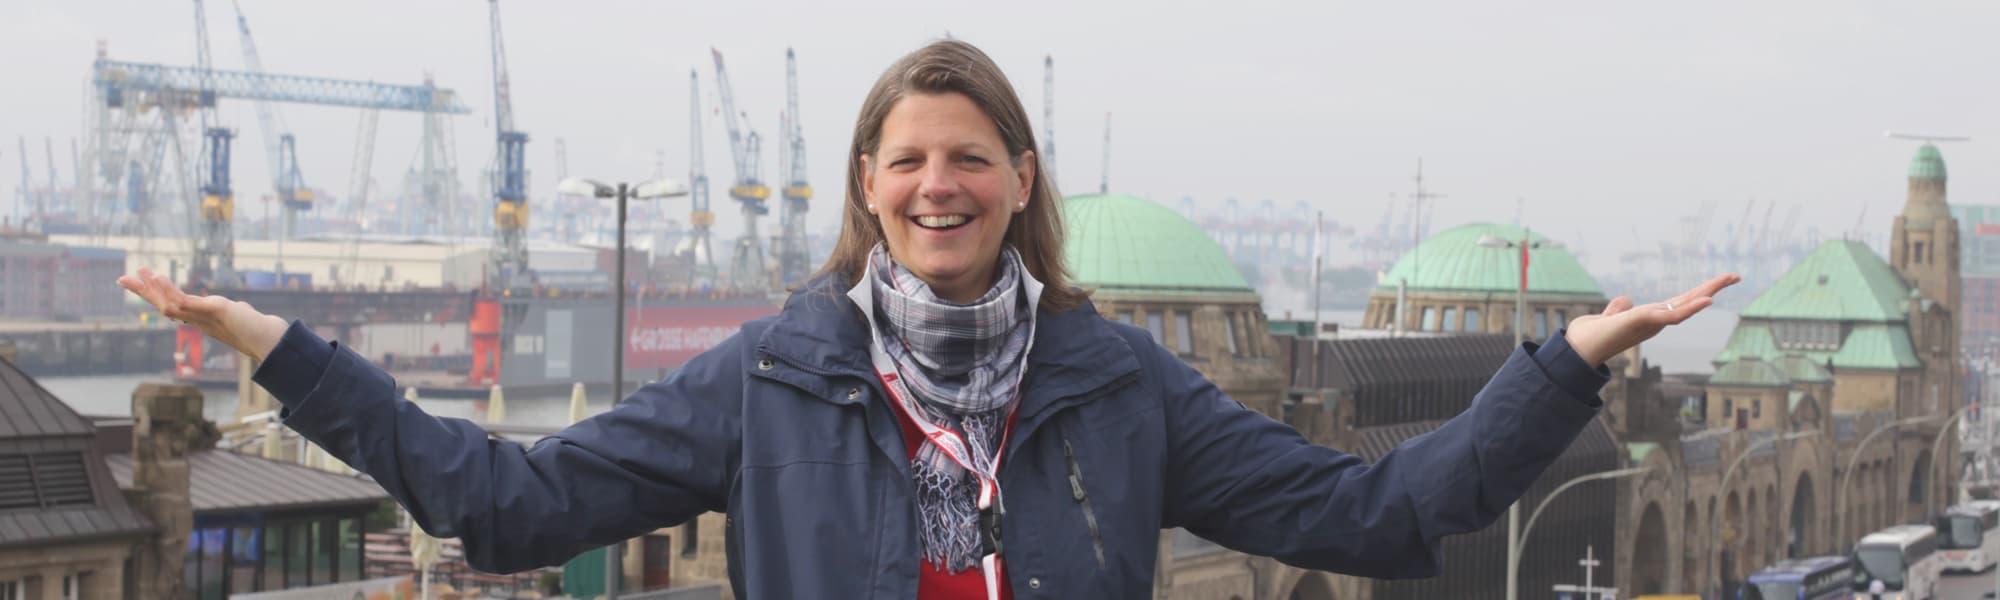 Guide Daniela St Pauli Landungsbrücken | Followme Hamburg